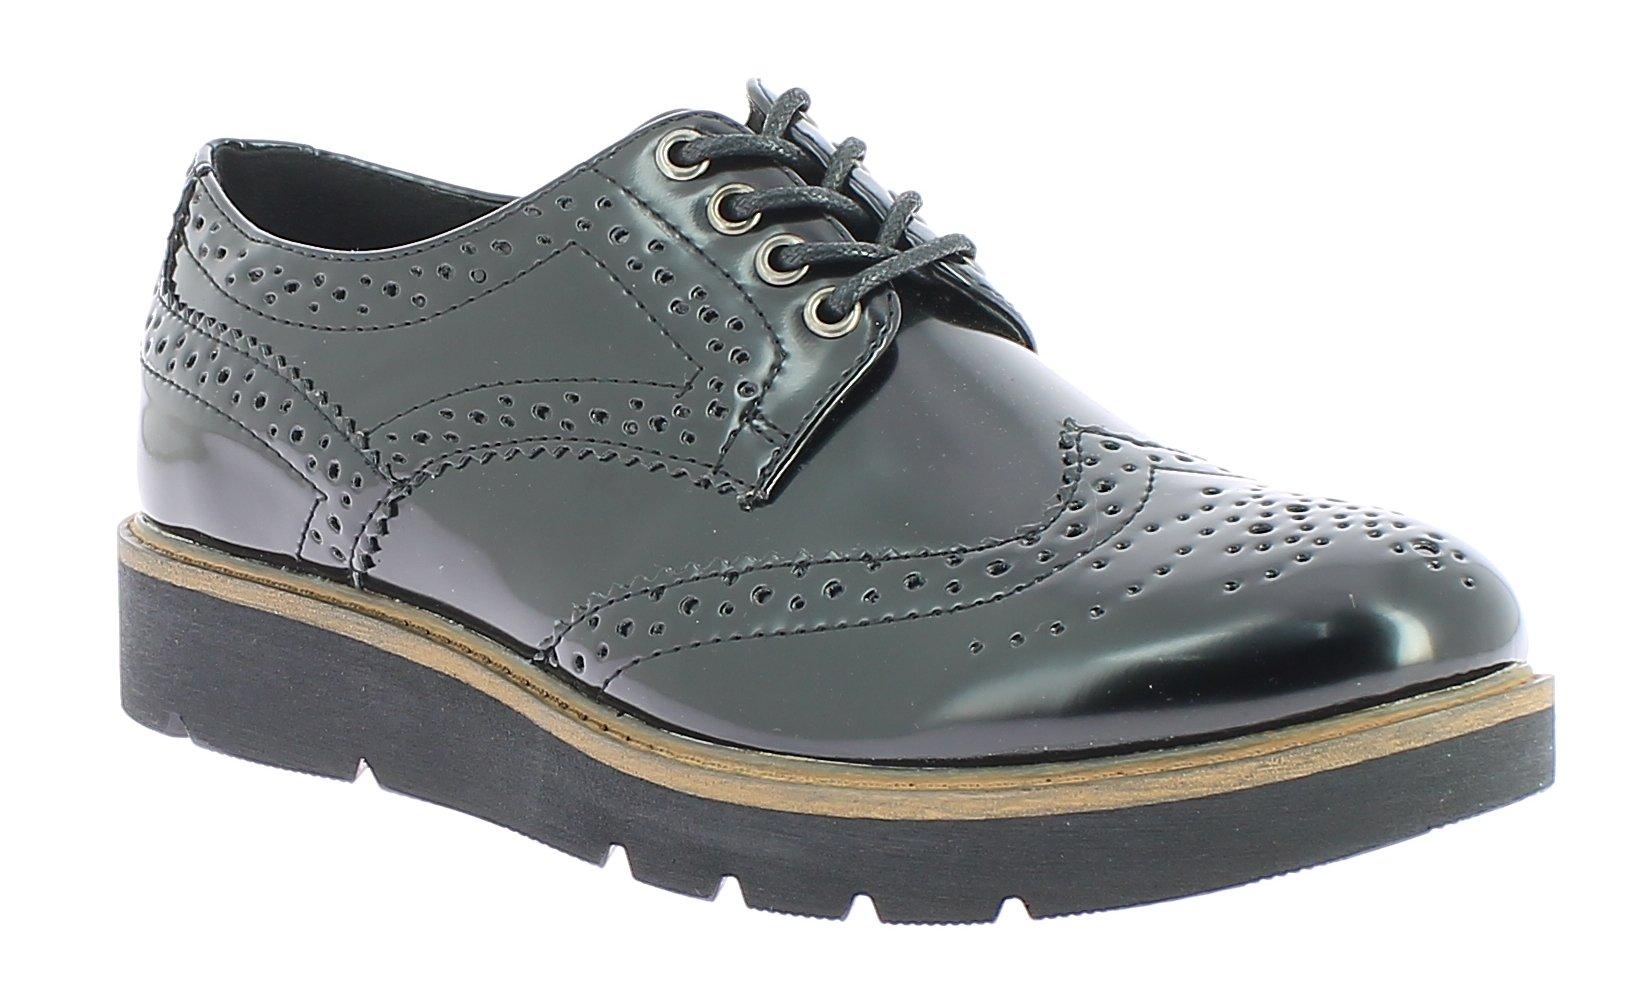 IQSHOES Γυναικείο Casual 4616300101 Μαύρο - IqShoes - 4616300101 BLACK-black-38/ προϊόντα παπούτσια